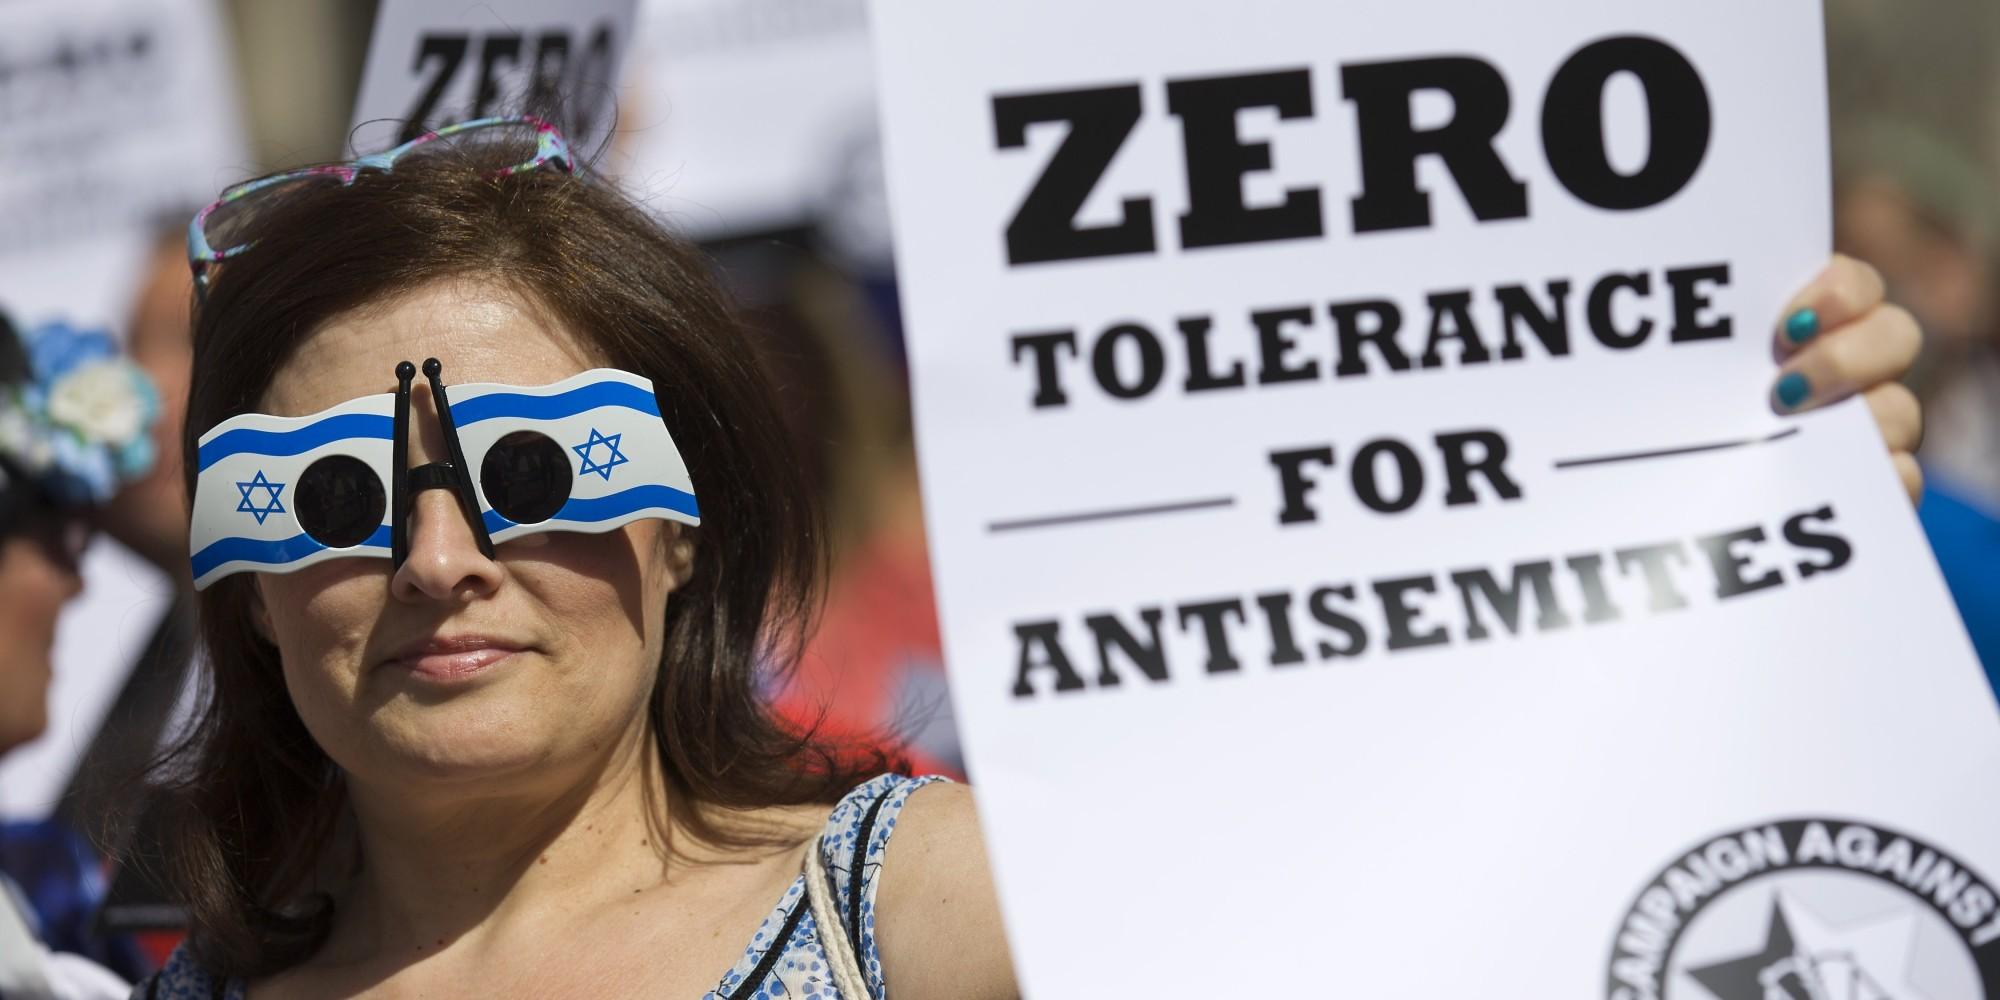 BRITAIN-ISRAEL-JEWS-PROTEST-ANTI SEMITISM